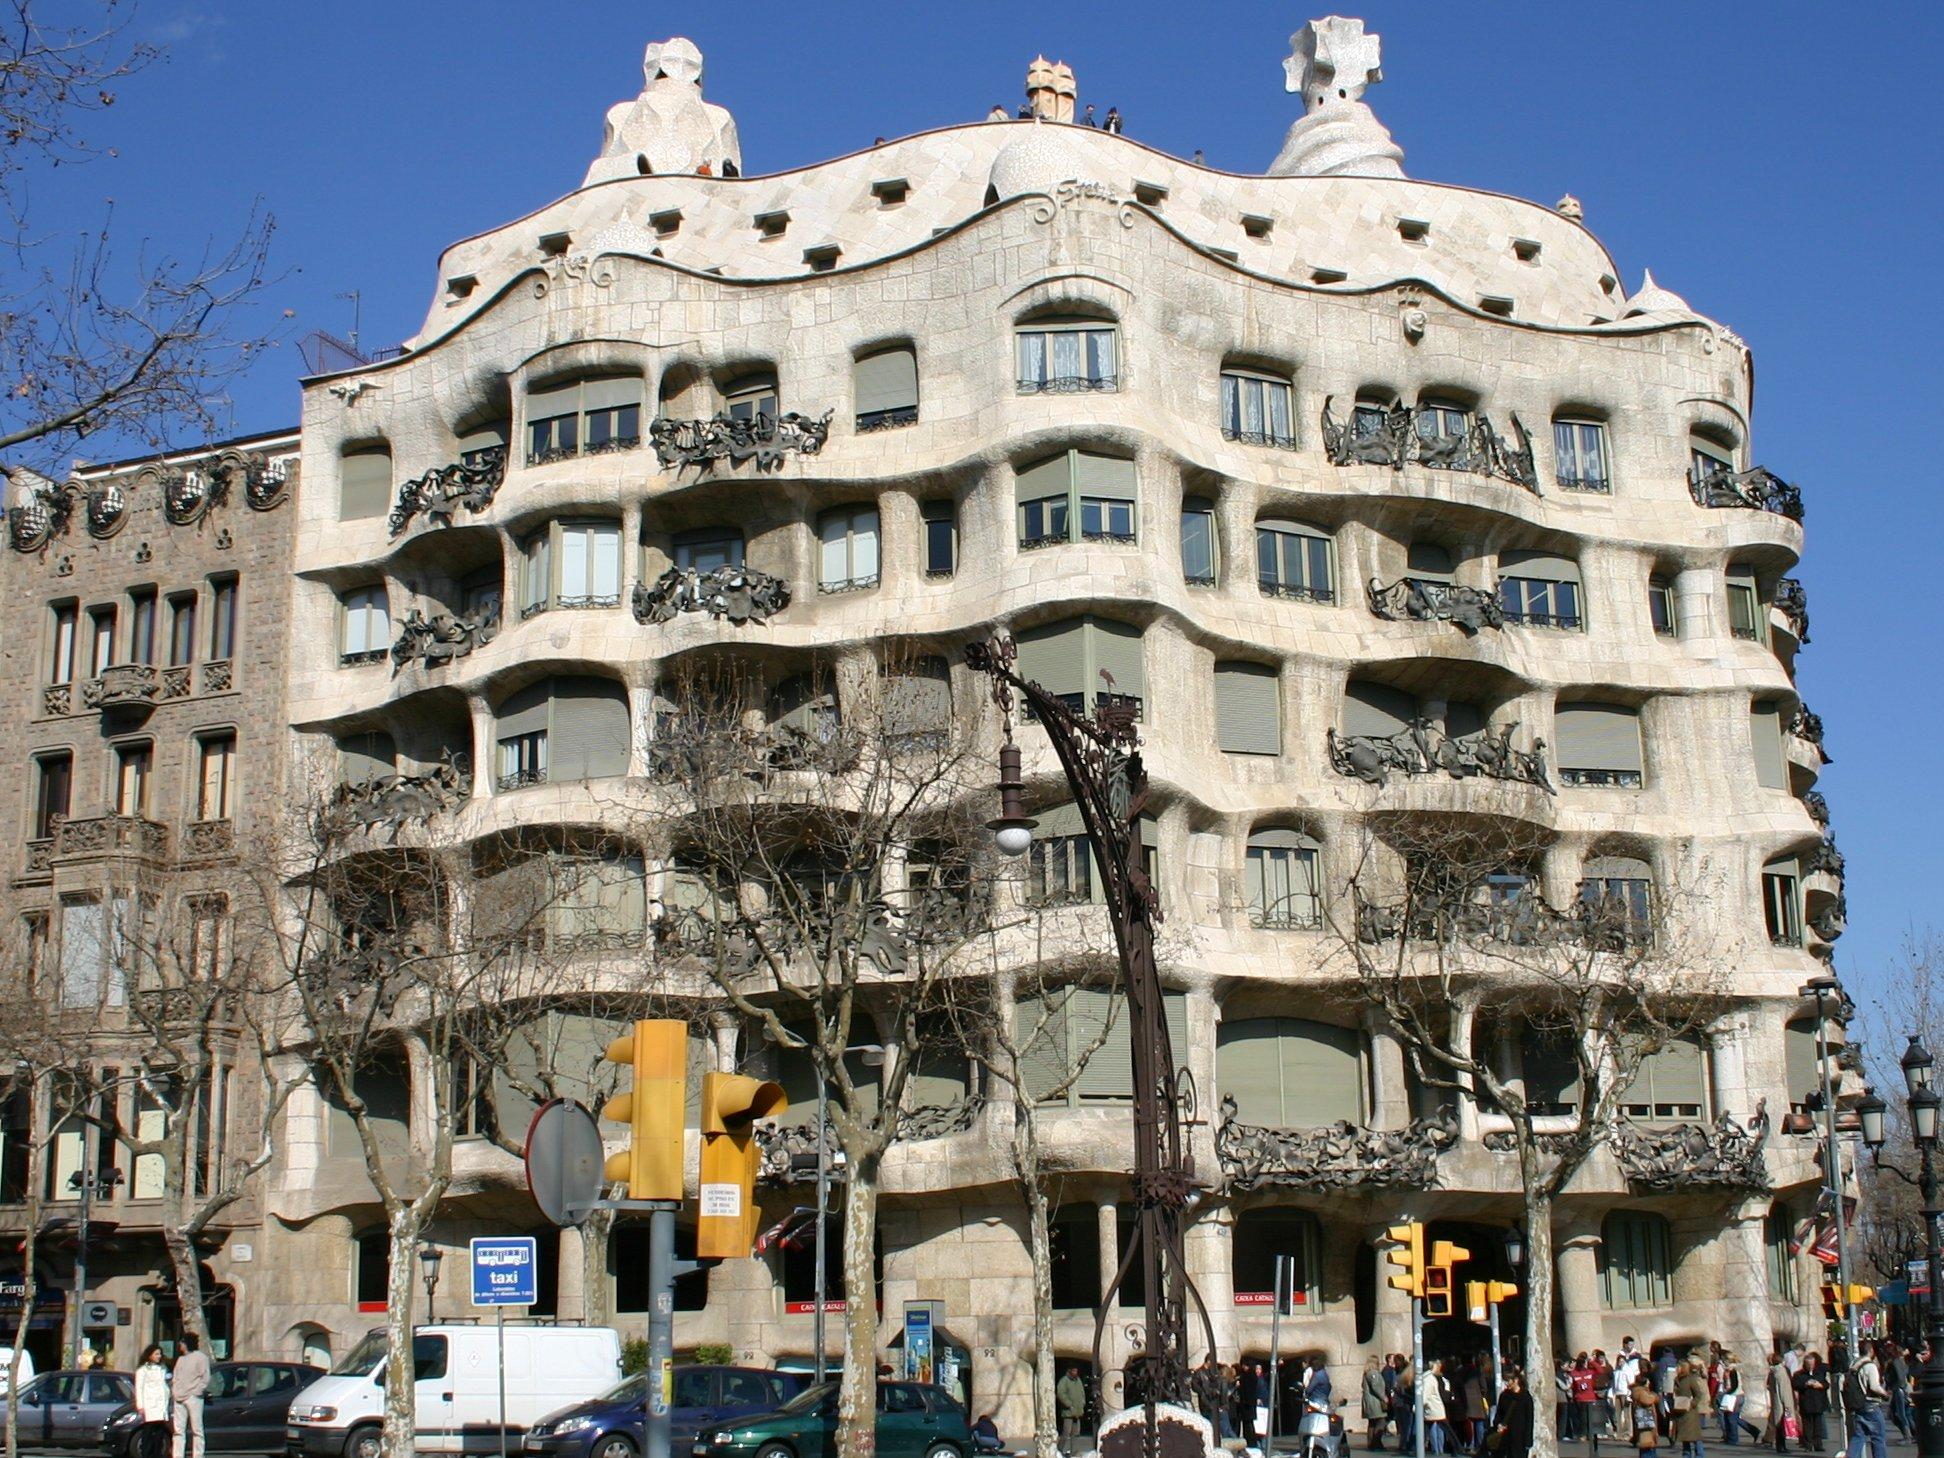 http://de.academic.ru/pictures/dewiki/83/Spain_Barcelona_Casa_Mila.jpg